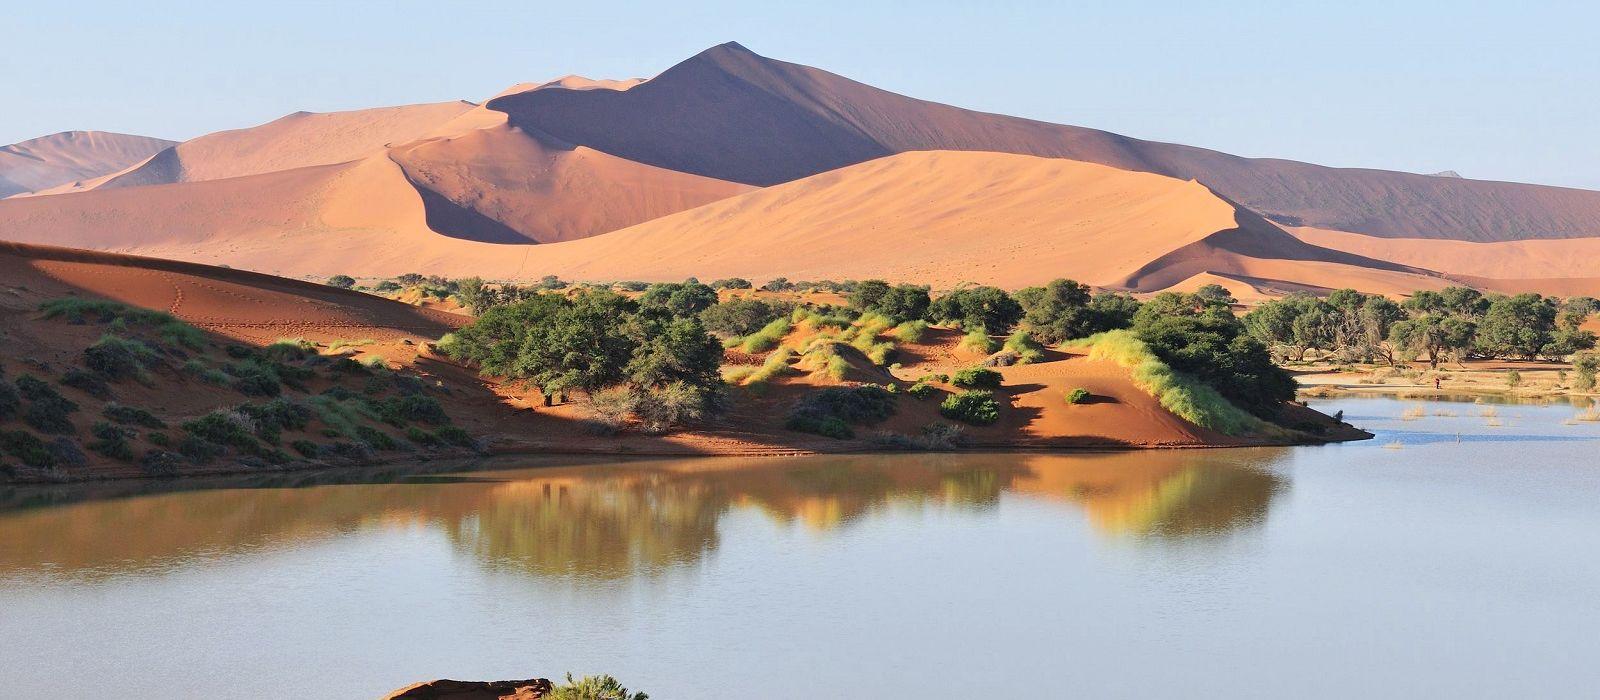 Selbstfahrer-Reise nach Südafrika, Namibia & Simbabwe: Nord Kap via Caprivi und Viktoriafälle Urlaub 1